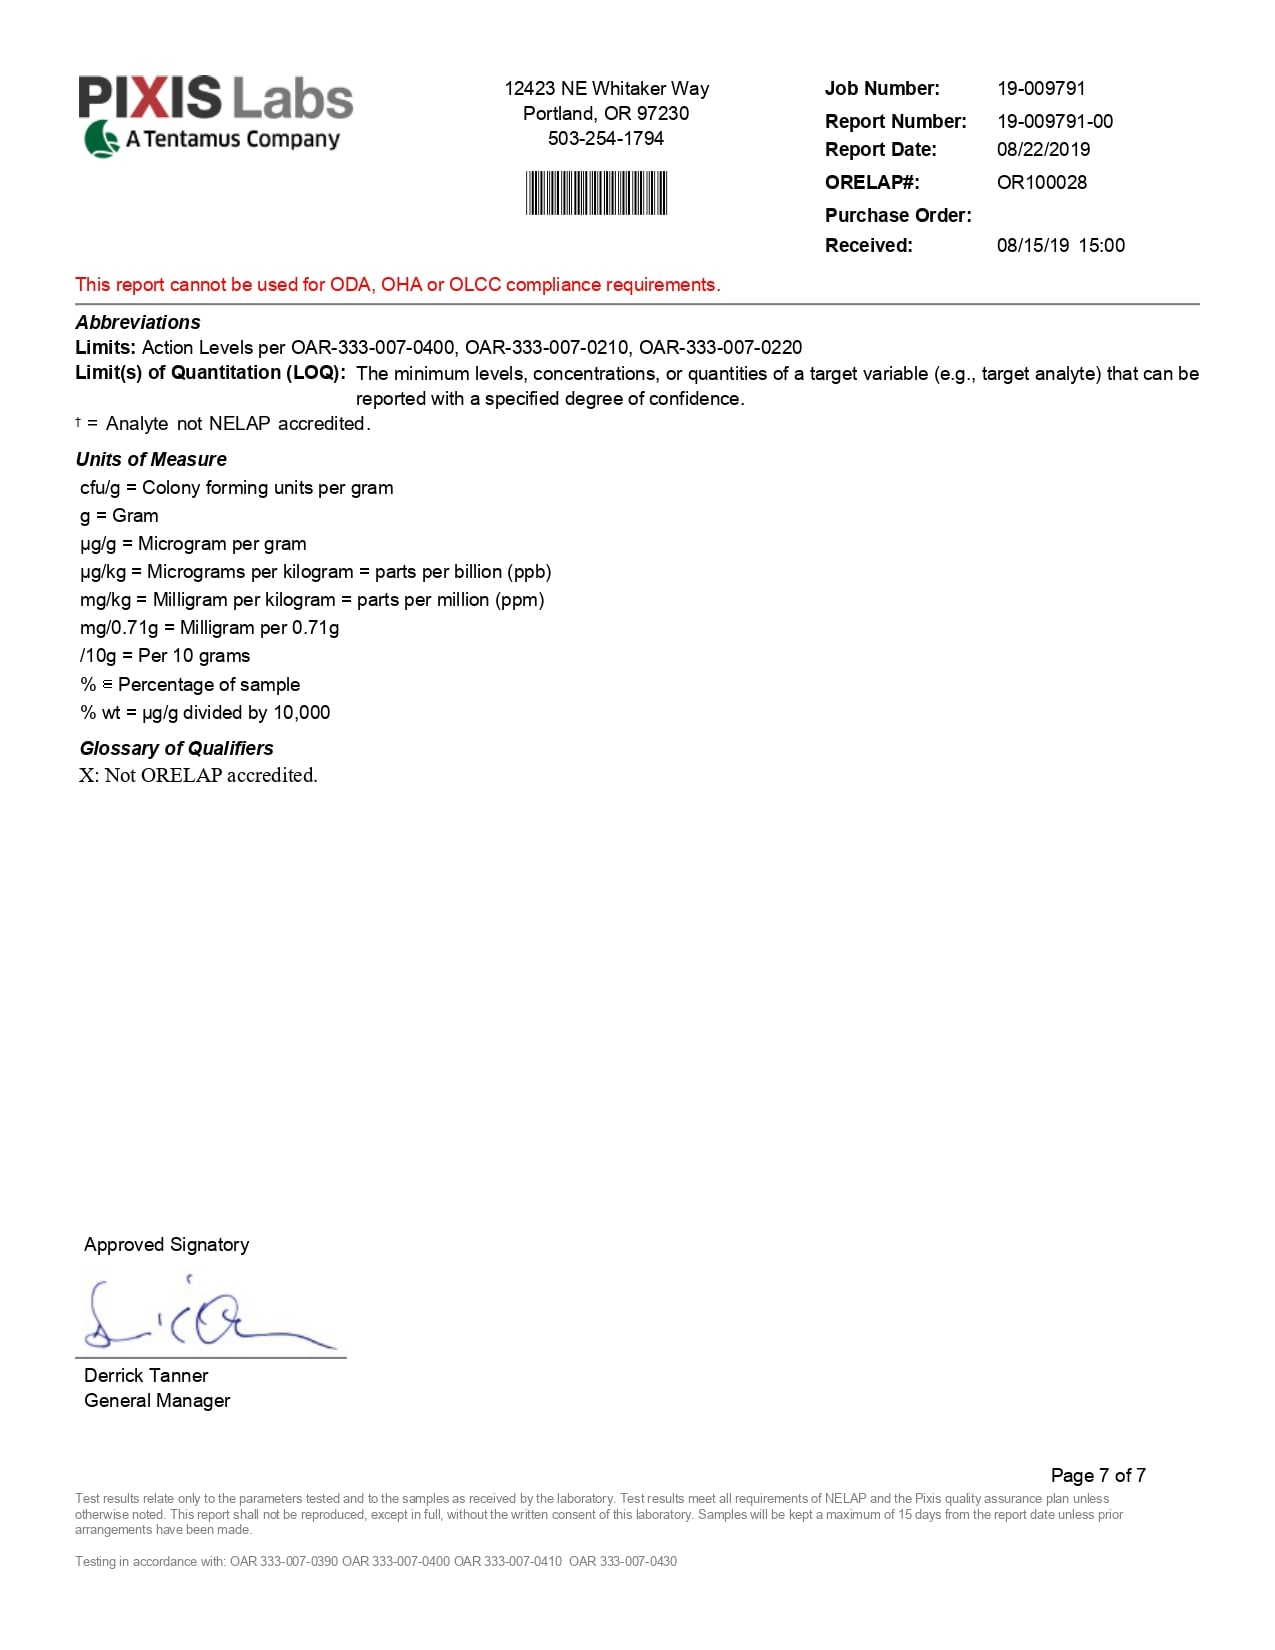 Social CBD Recover CBD Gel Capsules 1000mg Lab Report